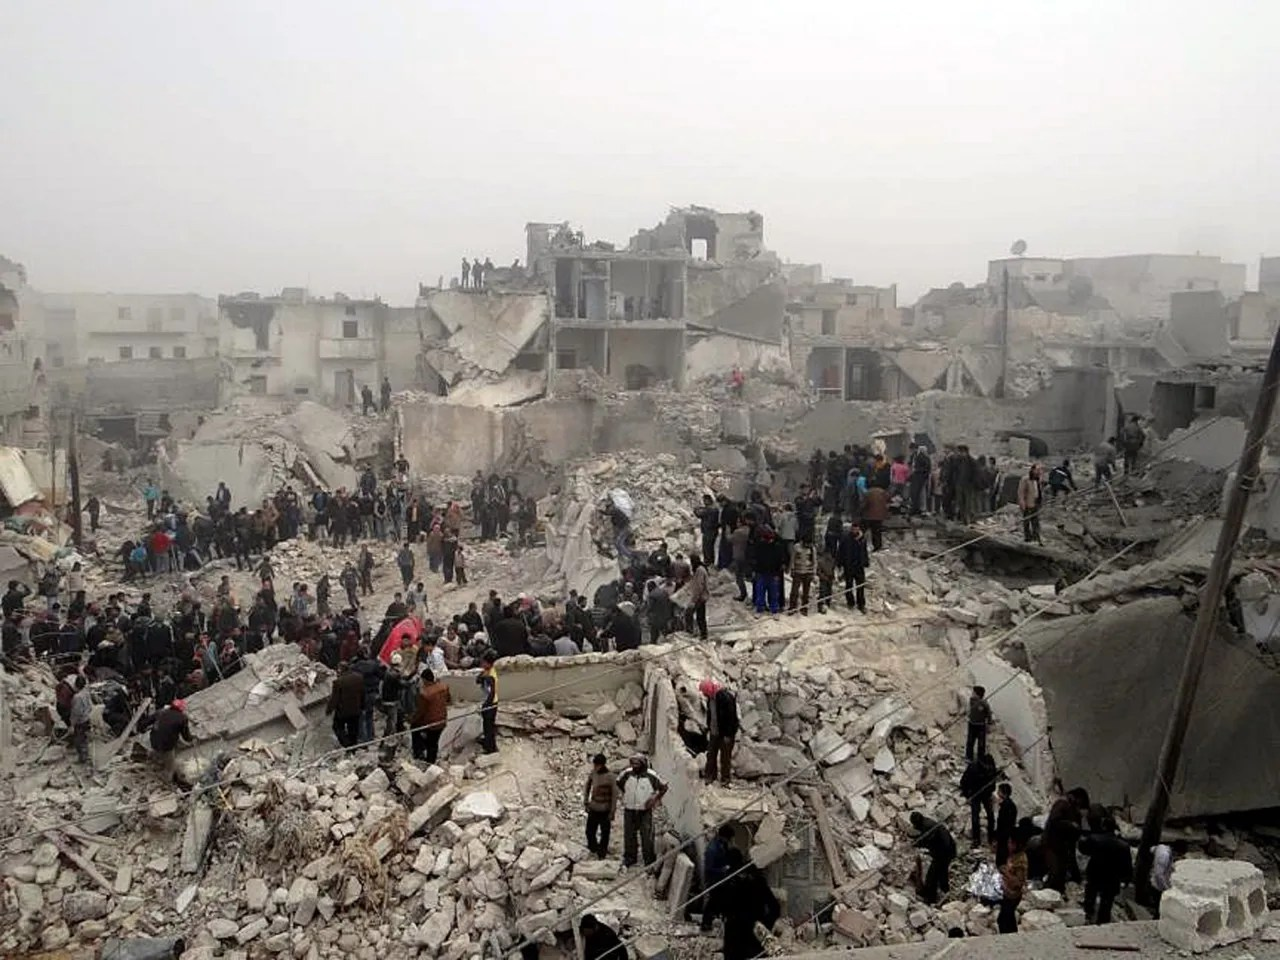 https://i2.wp.com/media.salon.com/2013/02/mideast-syria.jpeg20-1280x960.jpg